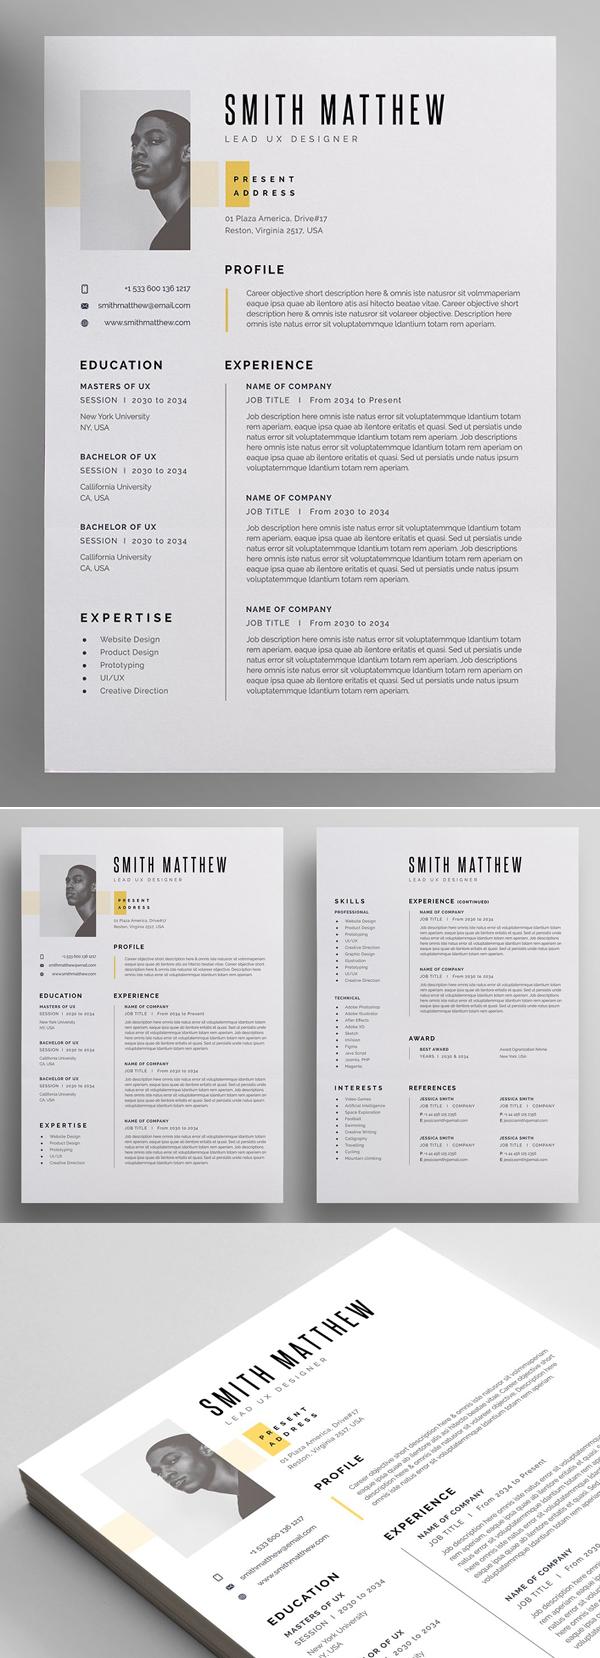 Simple Resume / CV Template